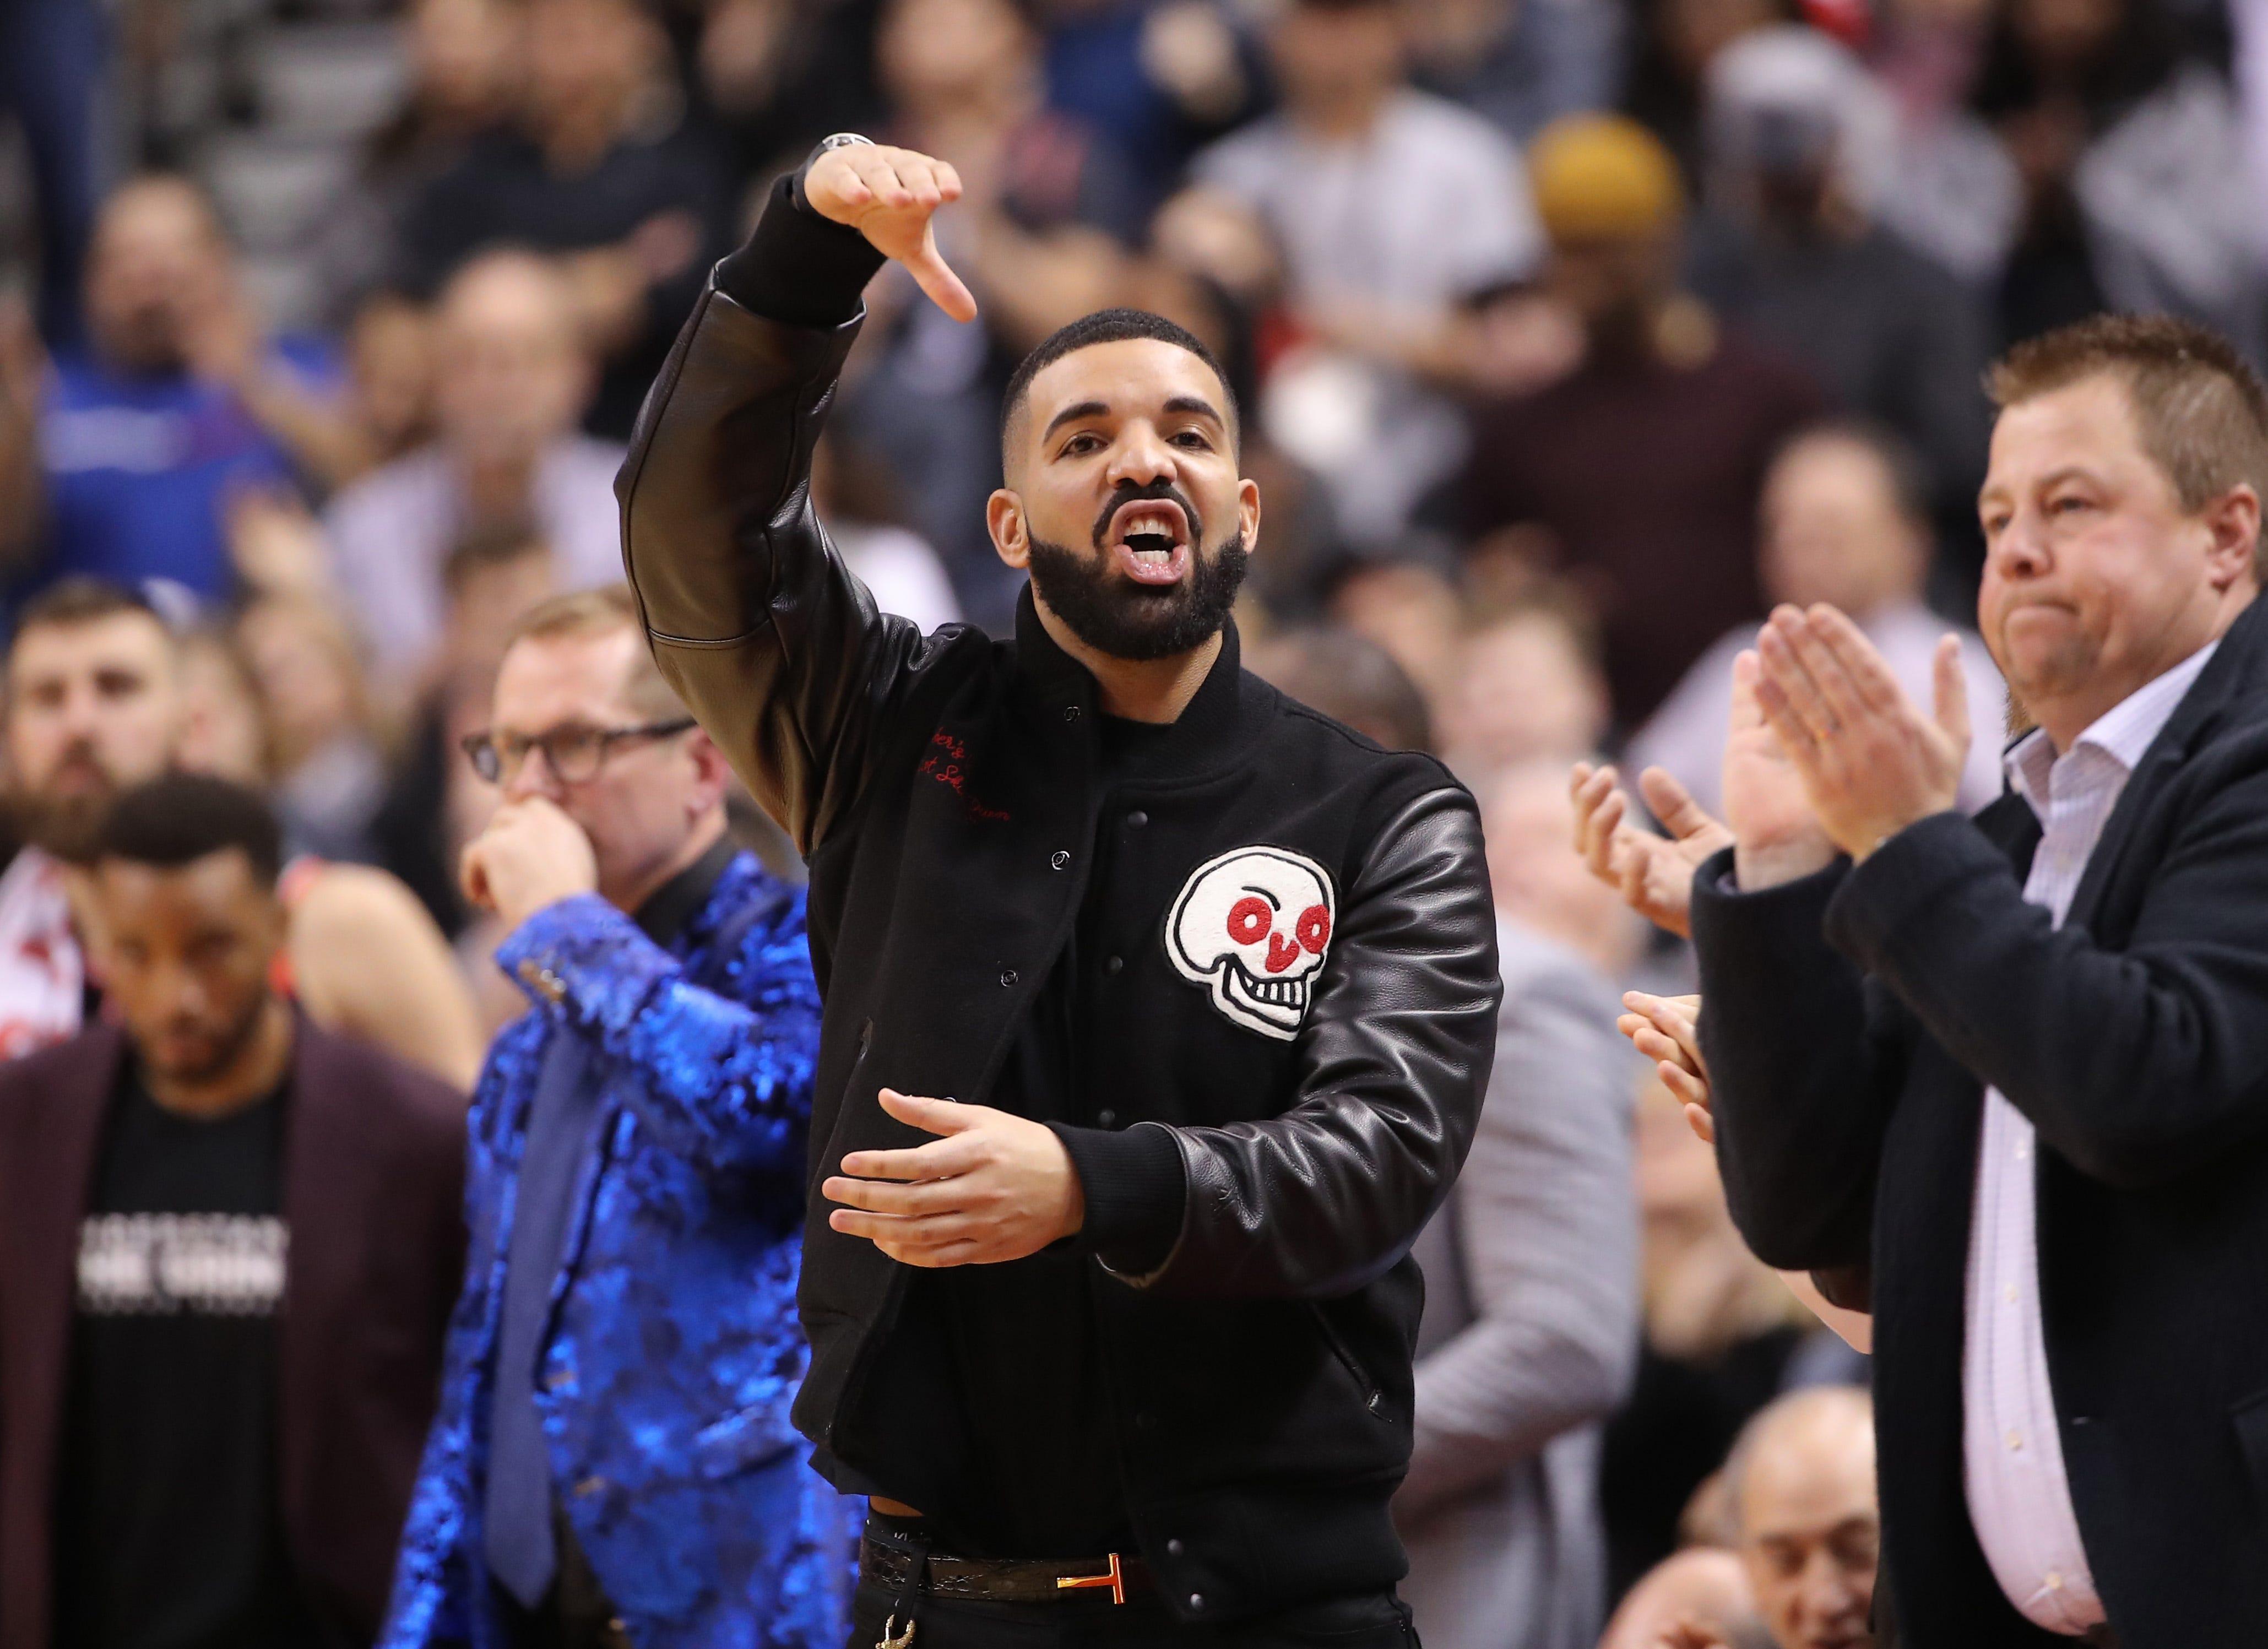 Drake 'curse' strikes again as Maple Leafs fall to Bruins in Game 4